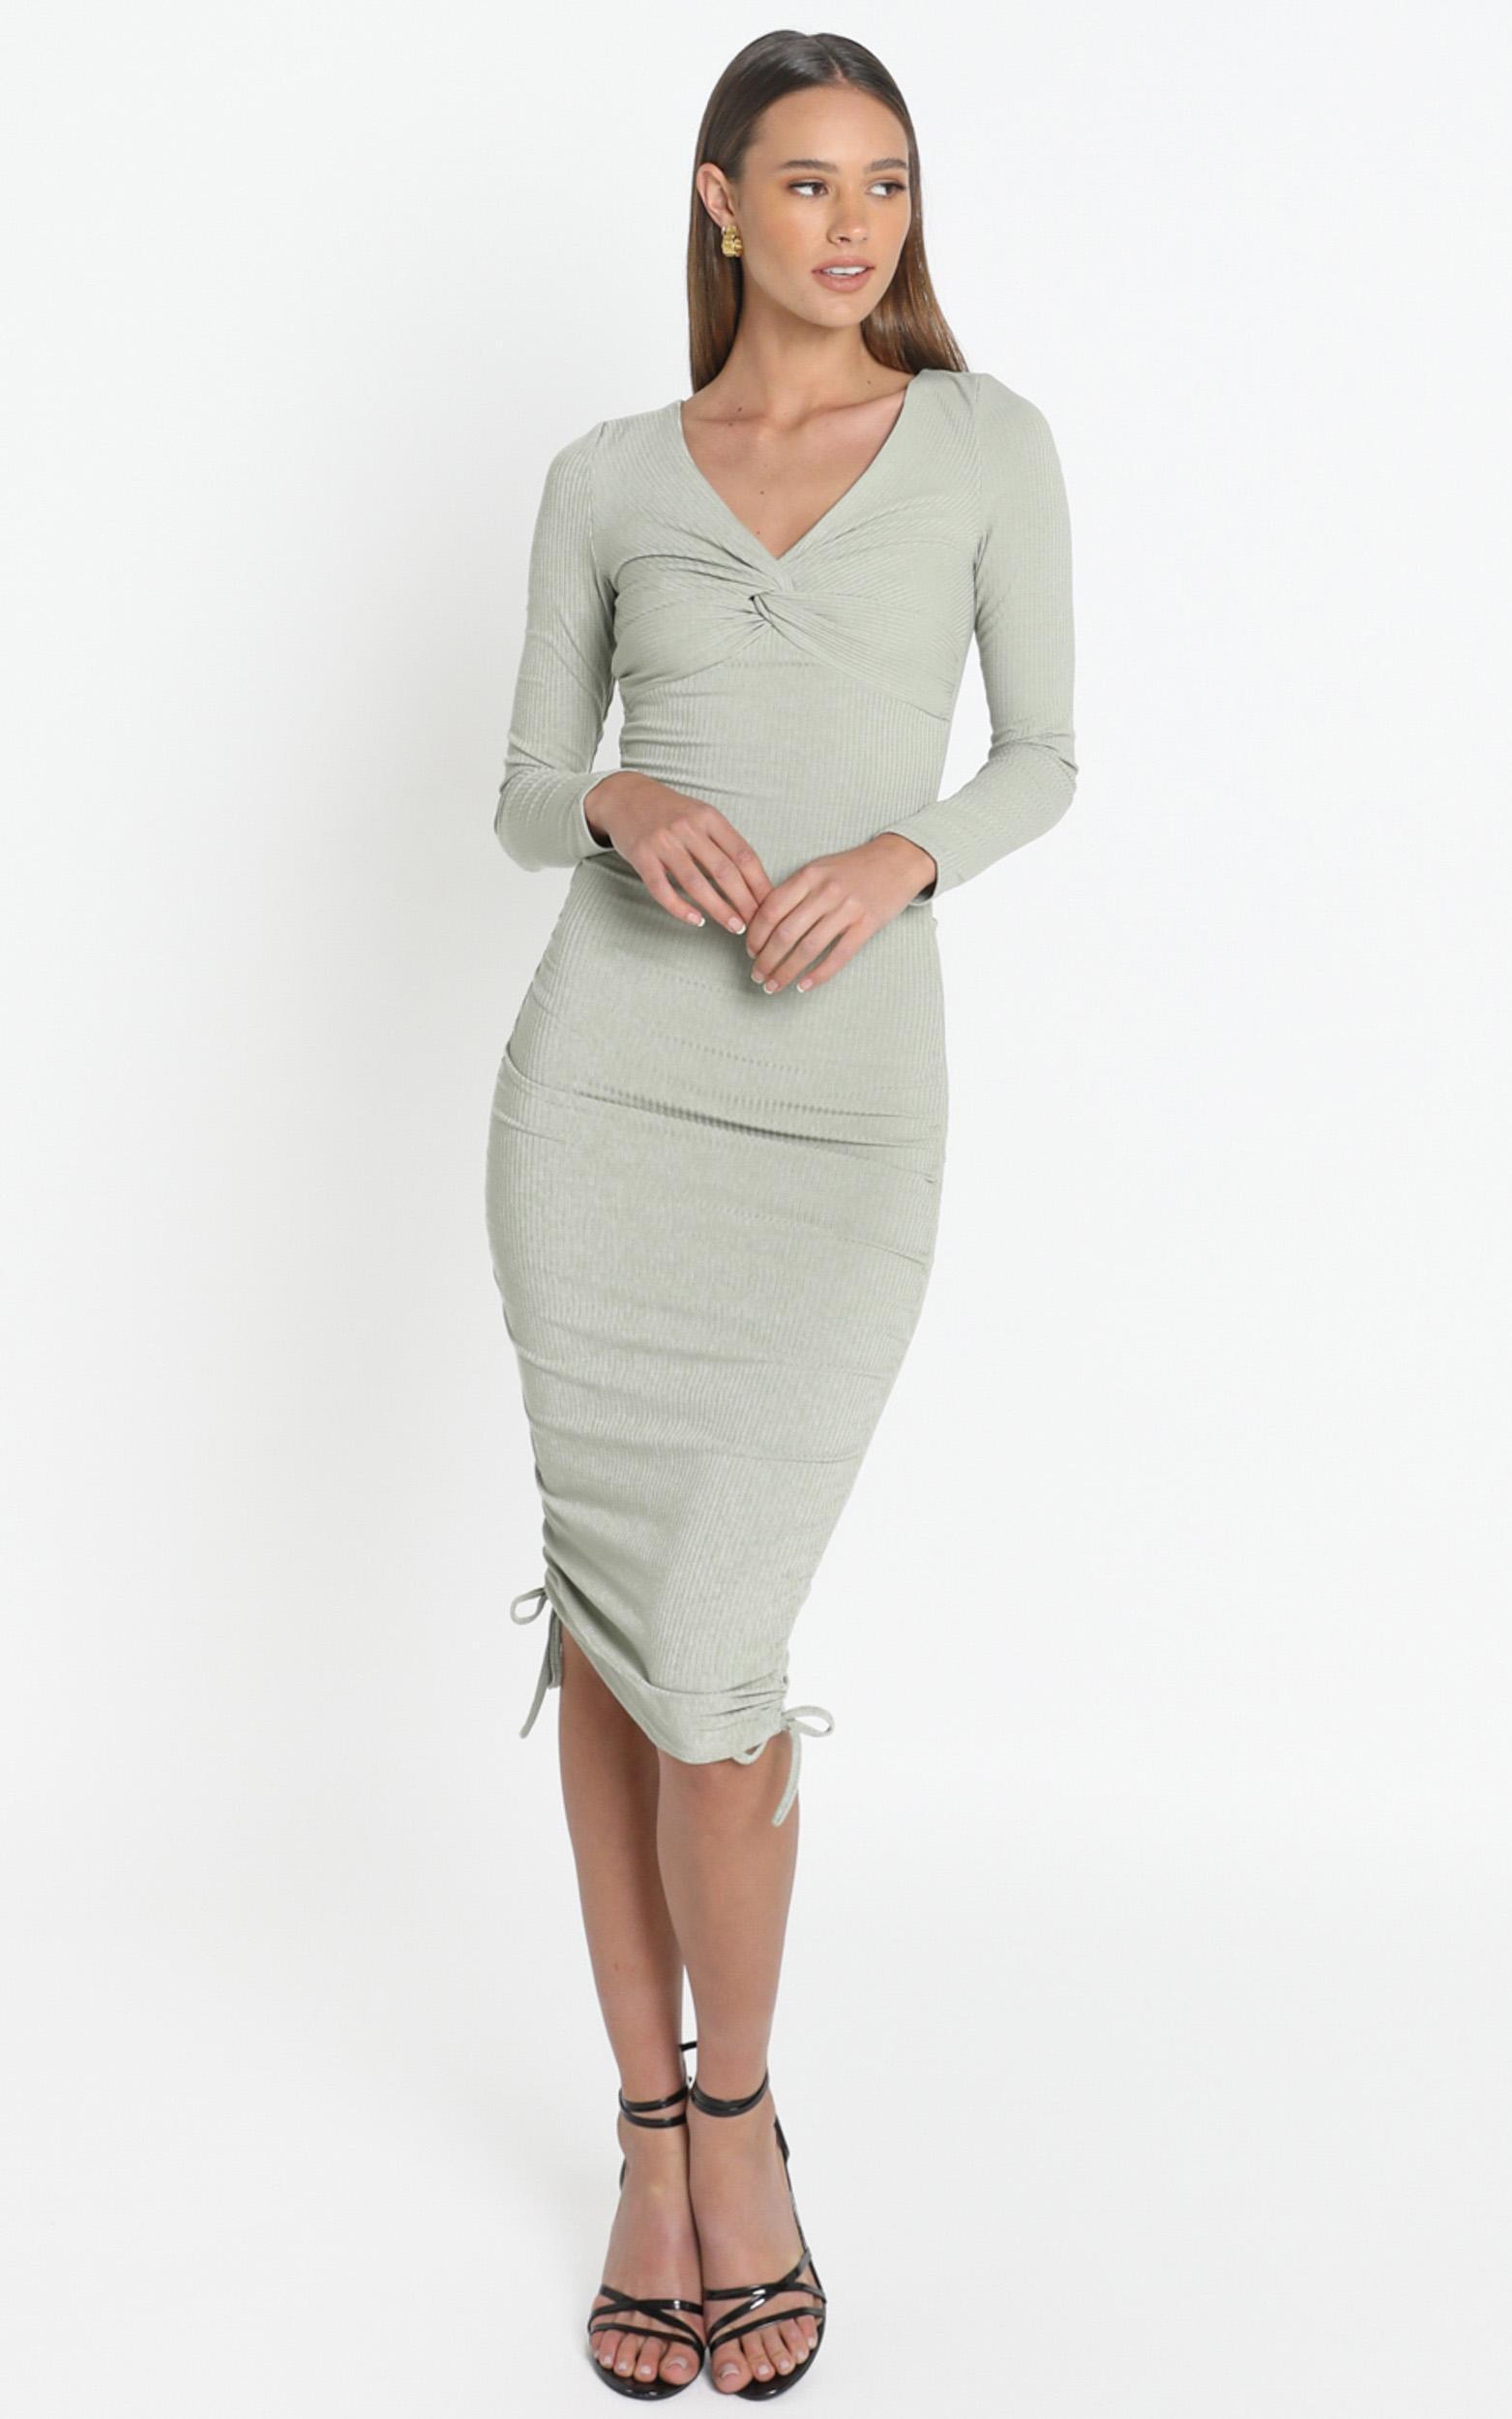 Naiya Dress in Khaki - 12 (L), Khaki, hi-res image number null